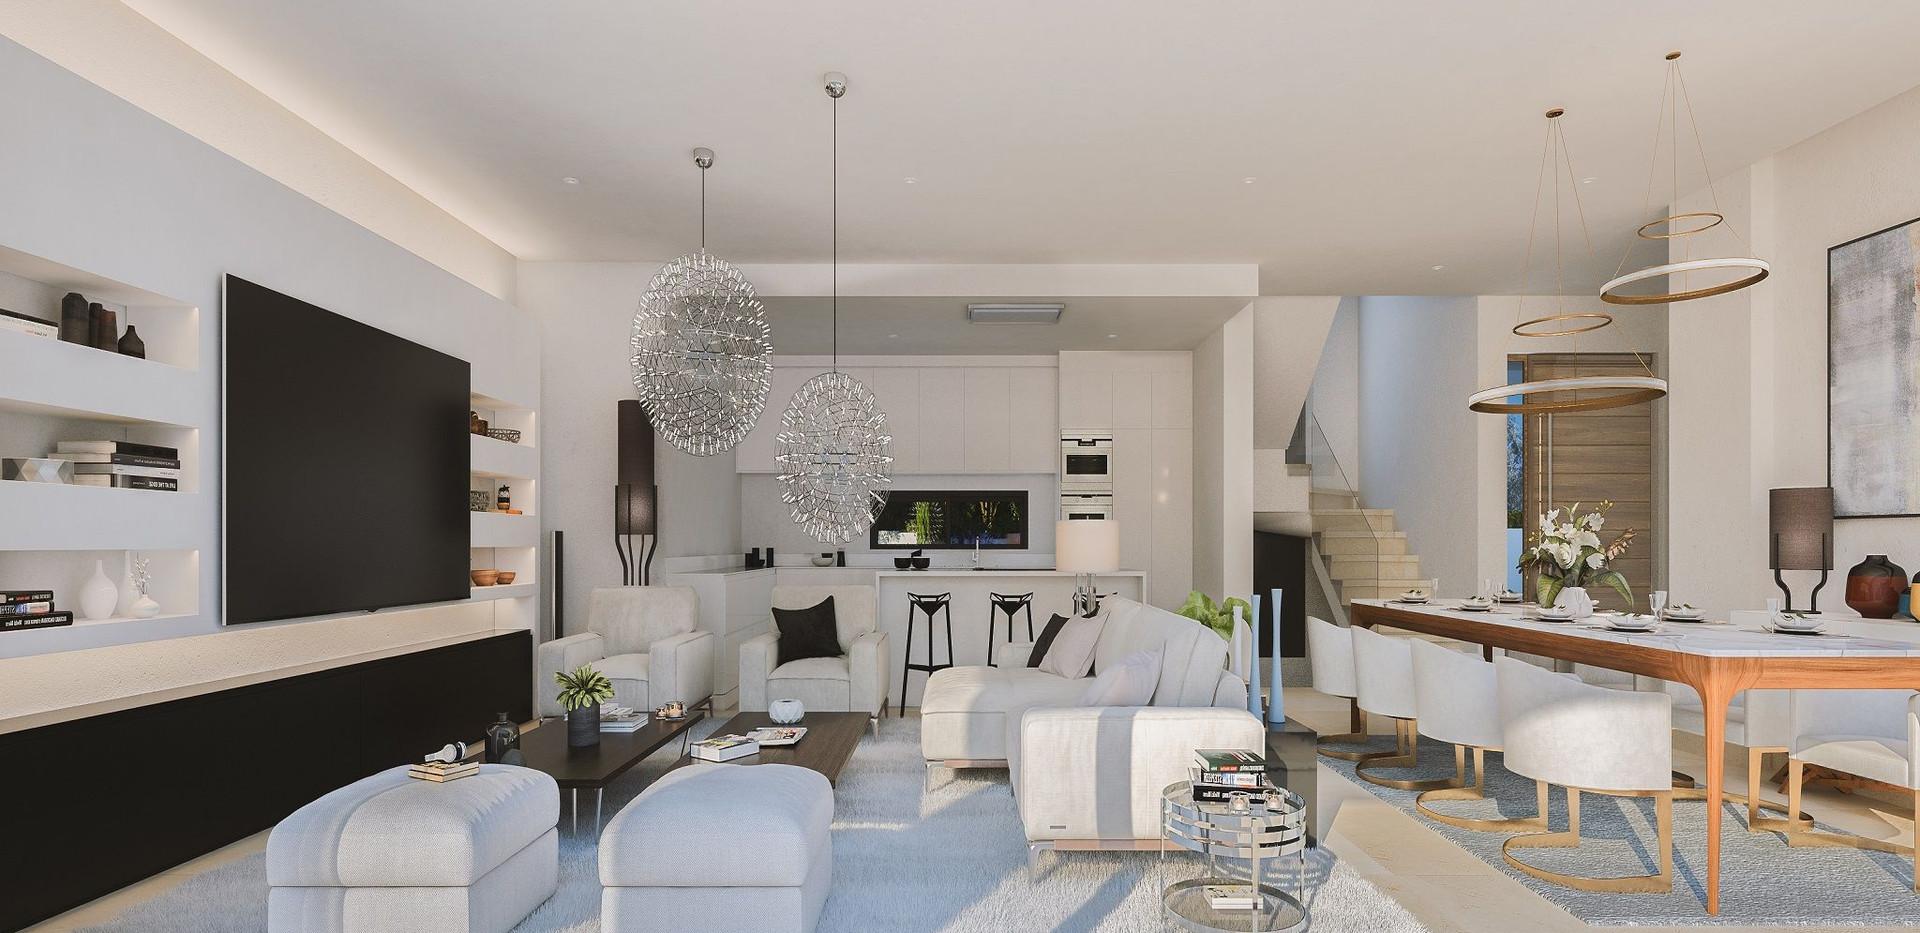 CaboRoyale-Livingroom-Type-A-2-1.jpg